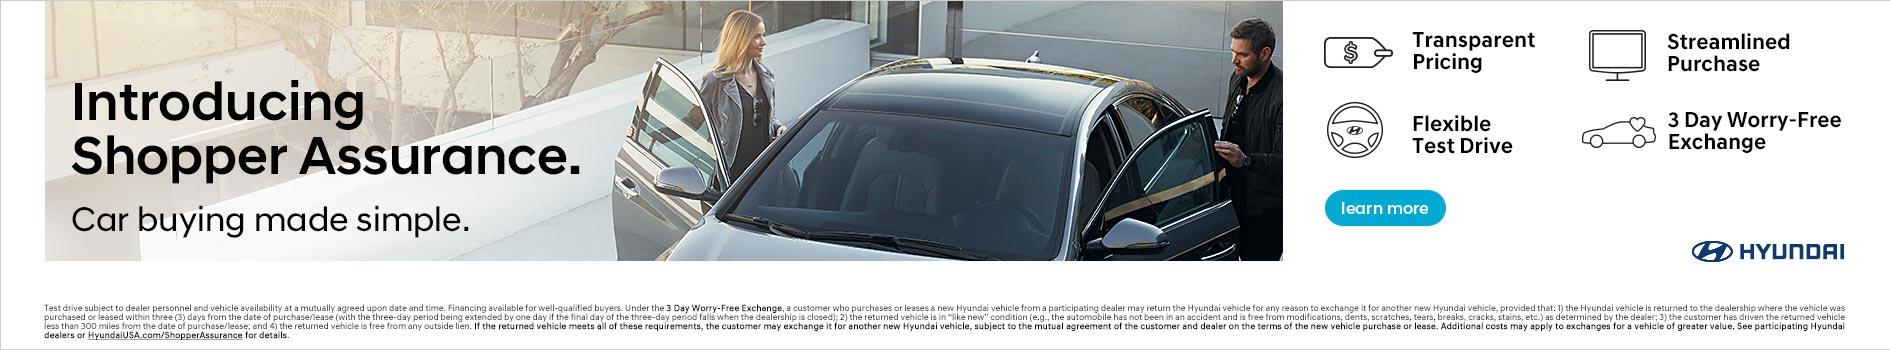 New Hyundai Models for Sale in Fresno, CA   Elantra, Sonata